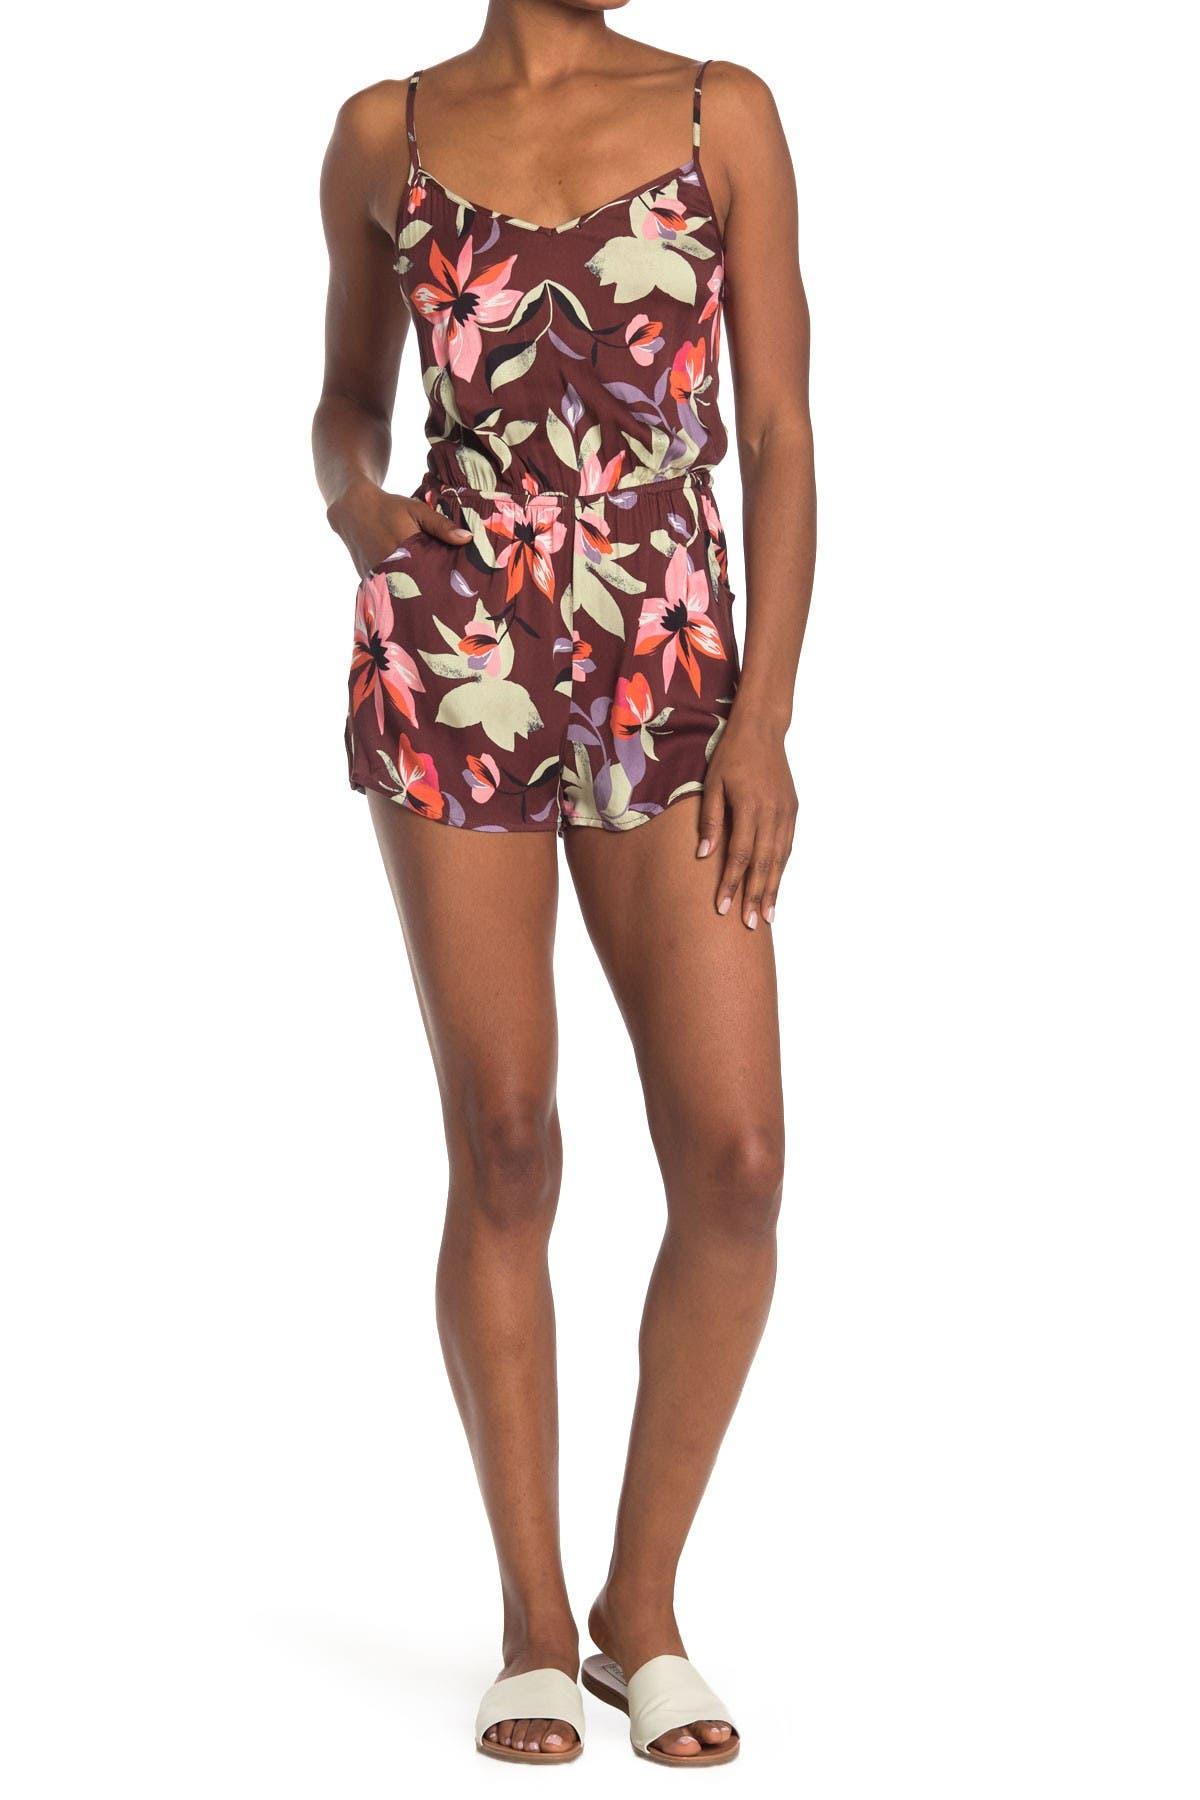 Image of The Bikini Lab Hot Tropics Floral Romper